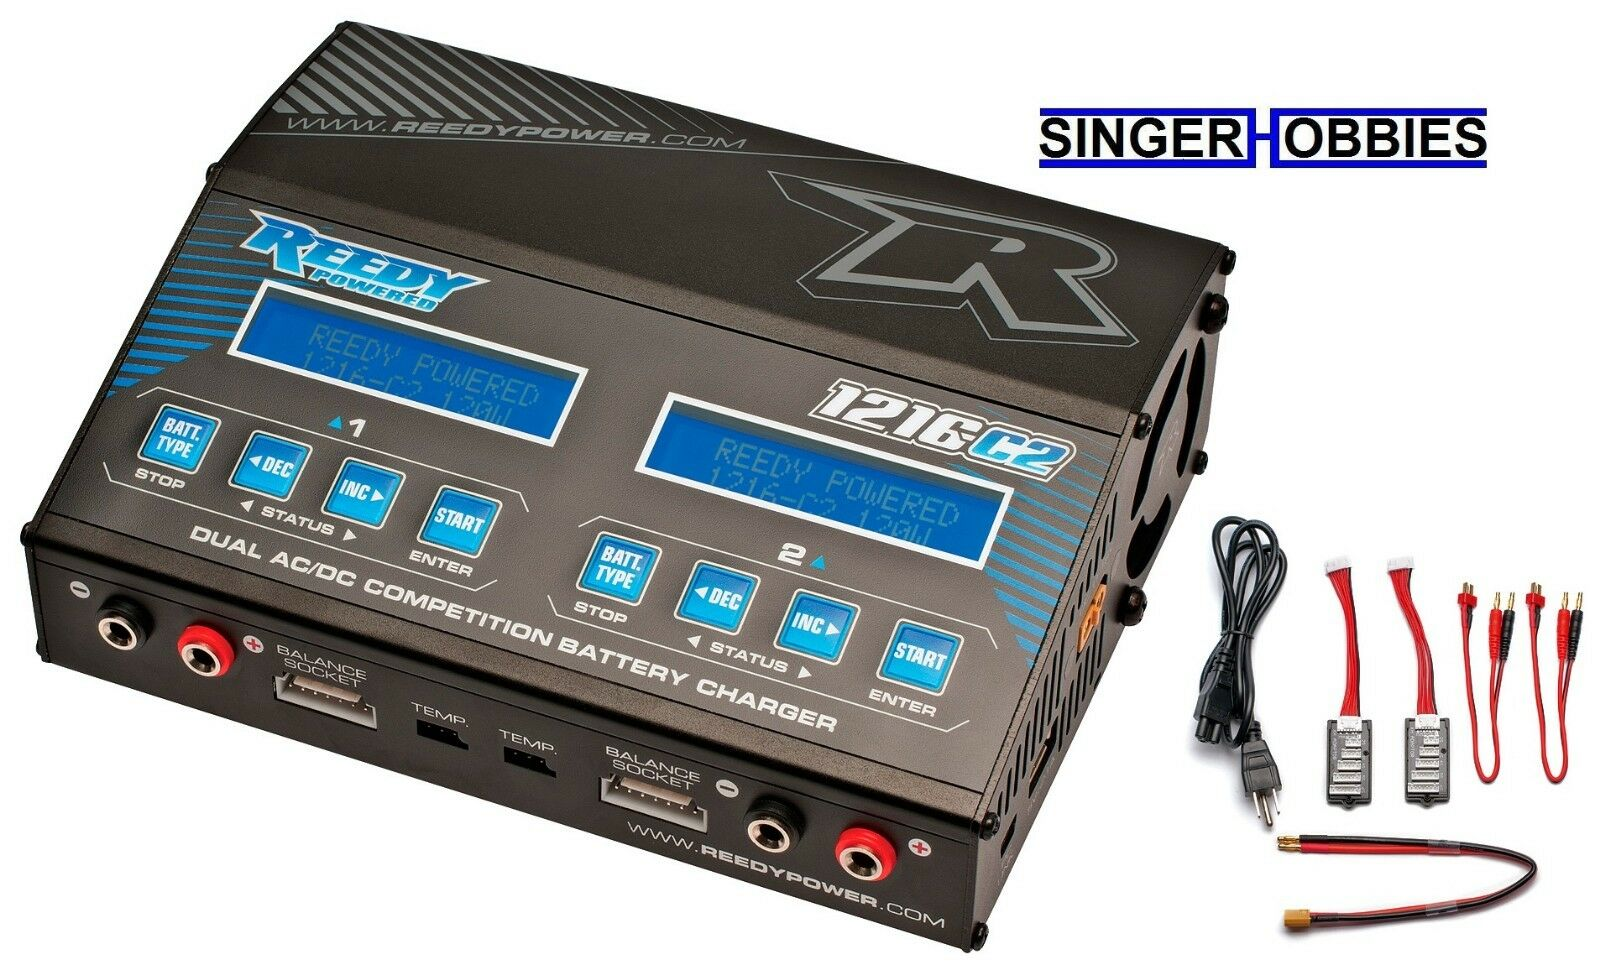 Reedy 1216-C2 doble Associated AC DC lithium-ion polímero, NiMH Tvc equilibrio cargador ASC27200 HRP